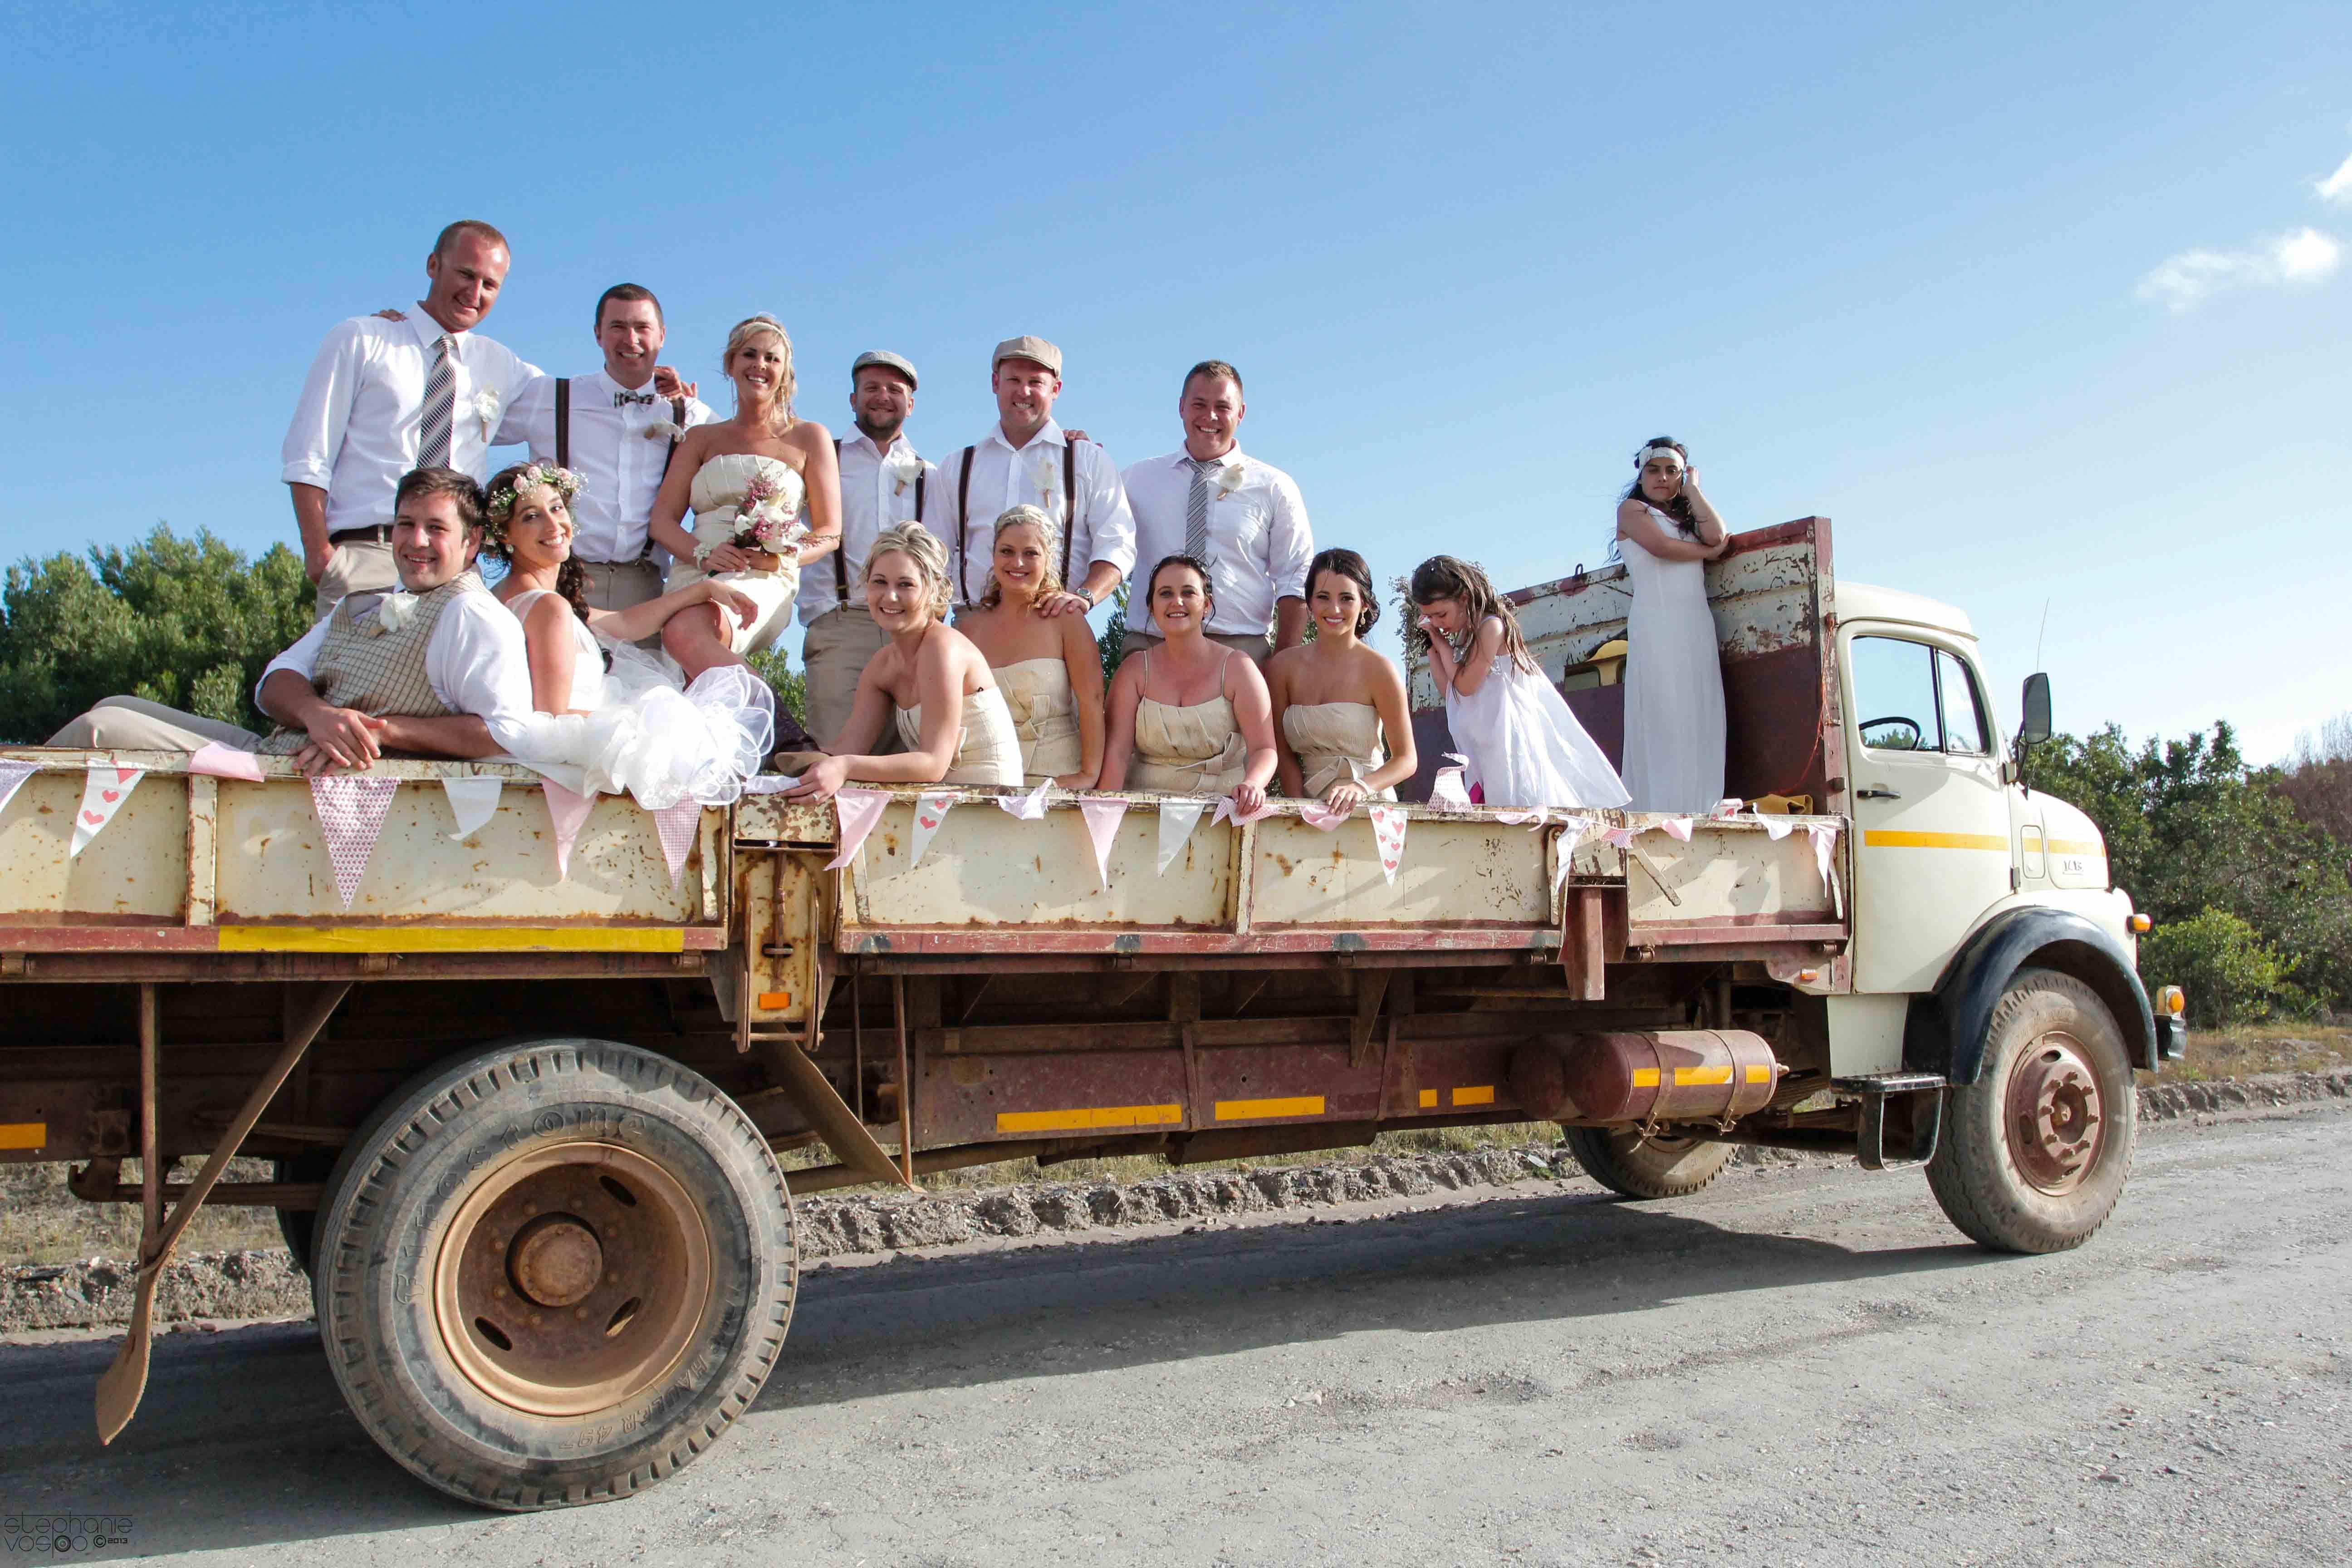 Wedding Transport Transportationwedding Day